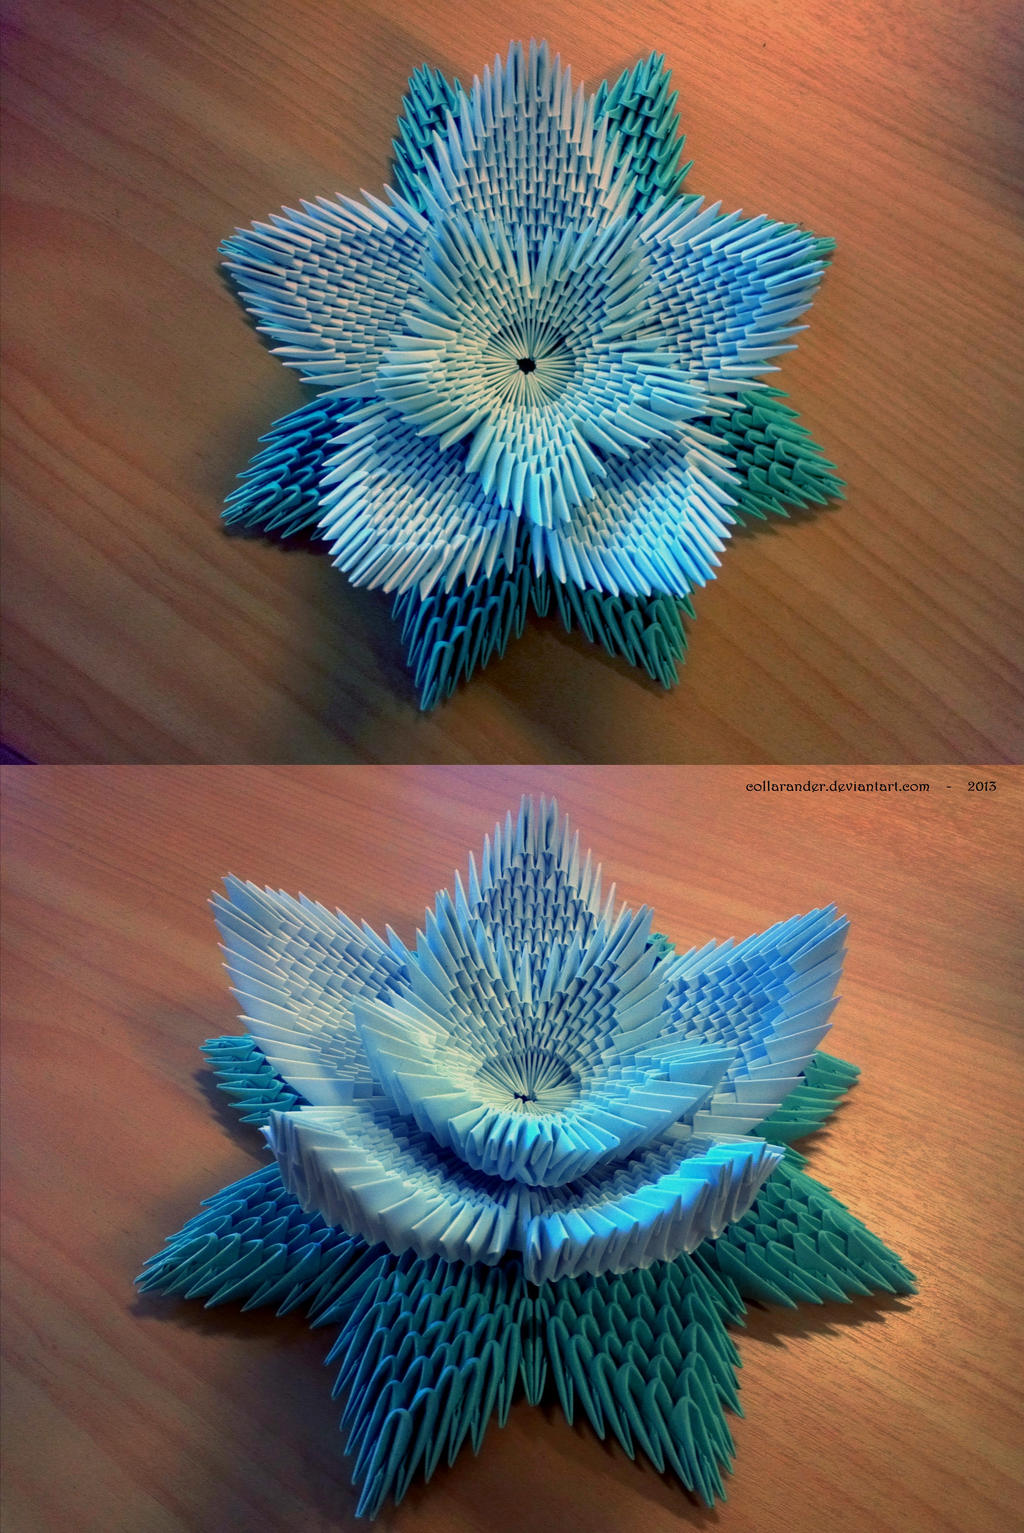 Large Origami Lotus by collarander